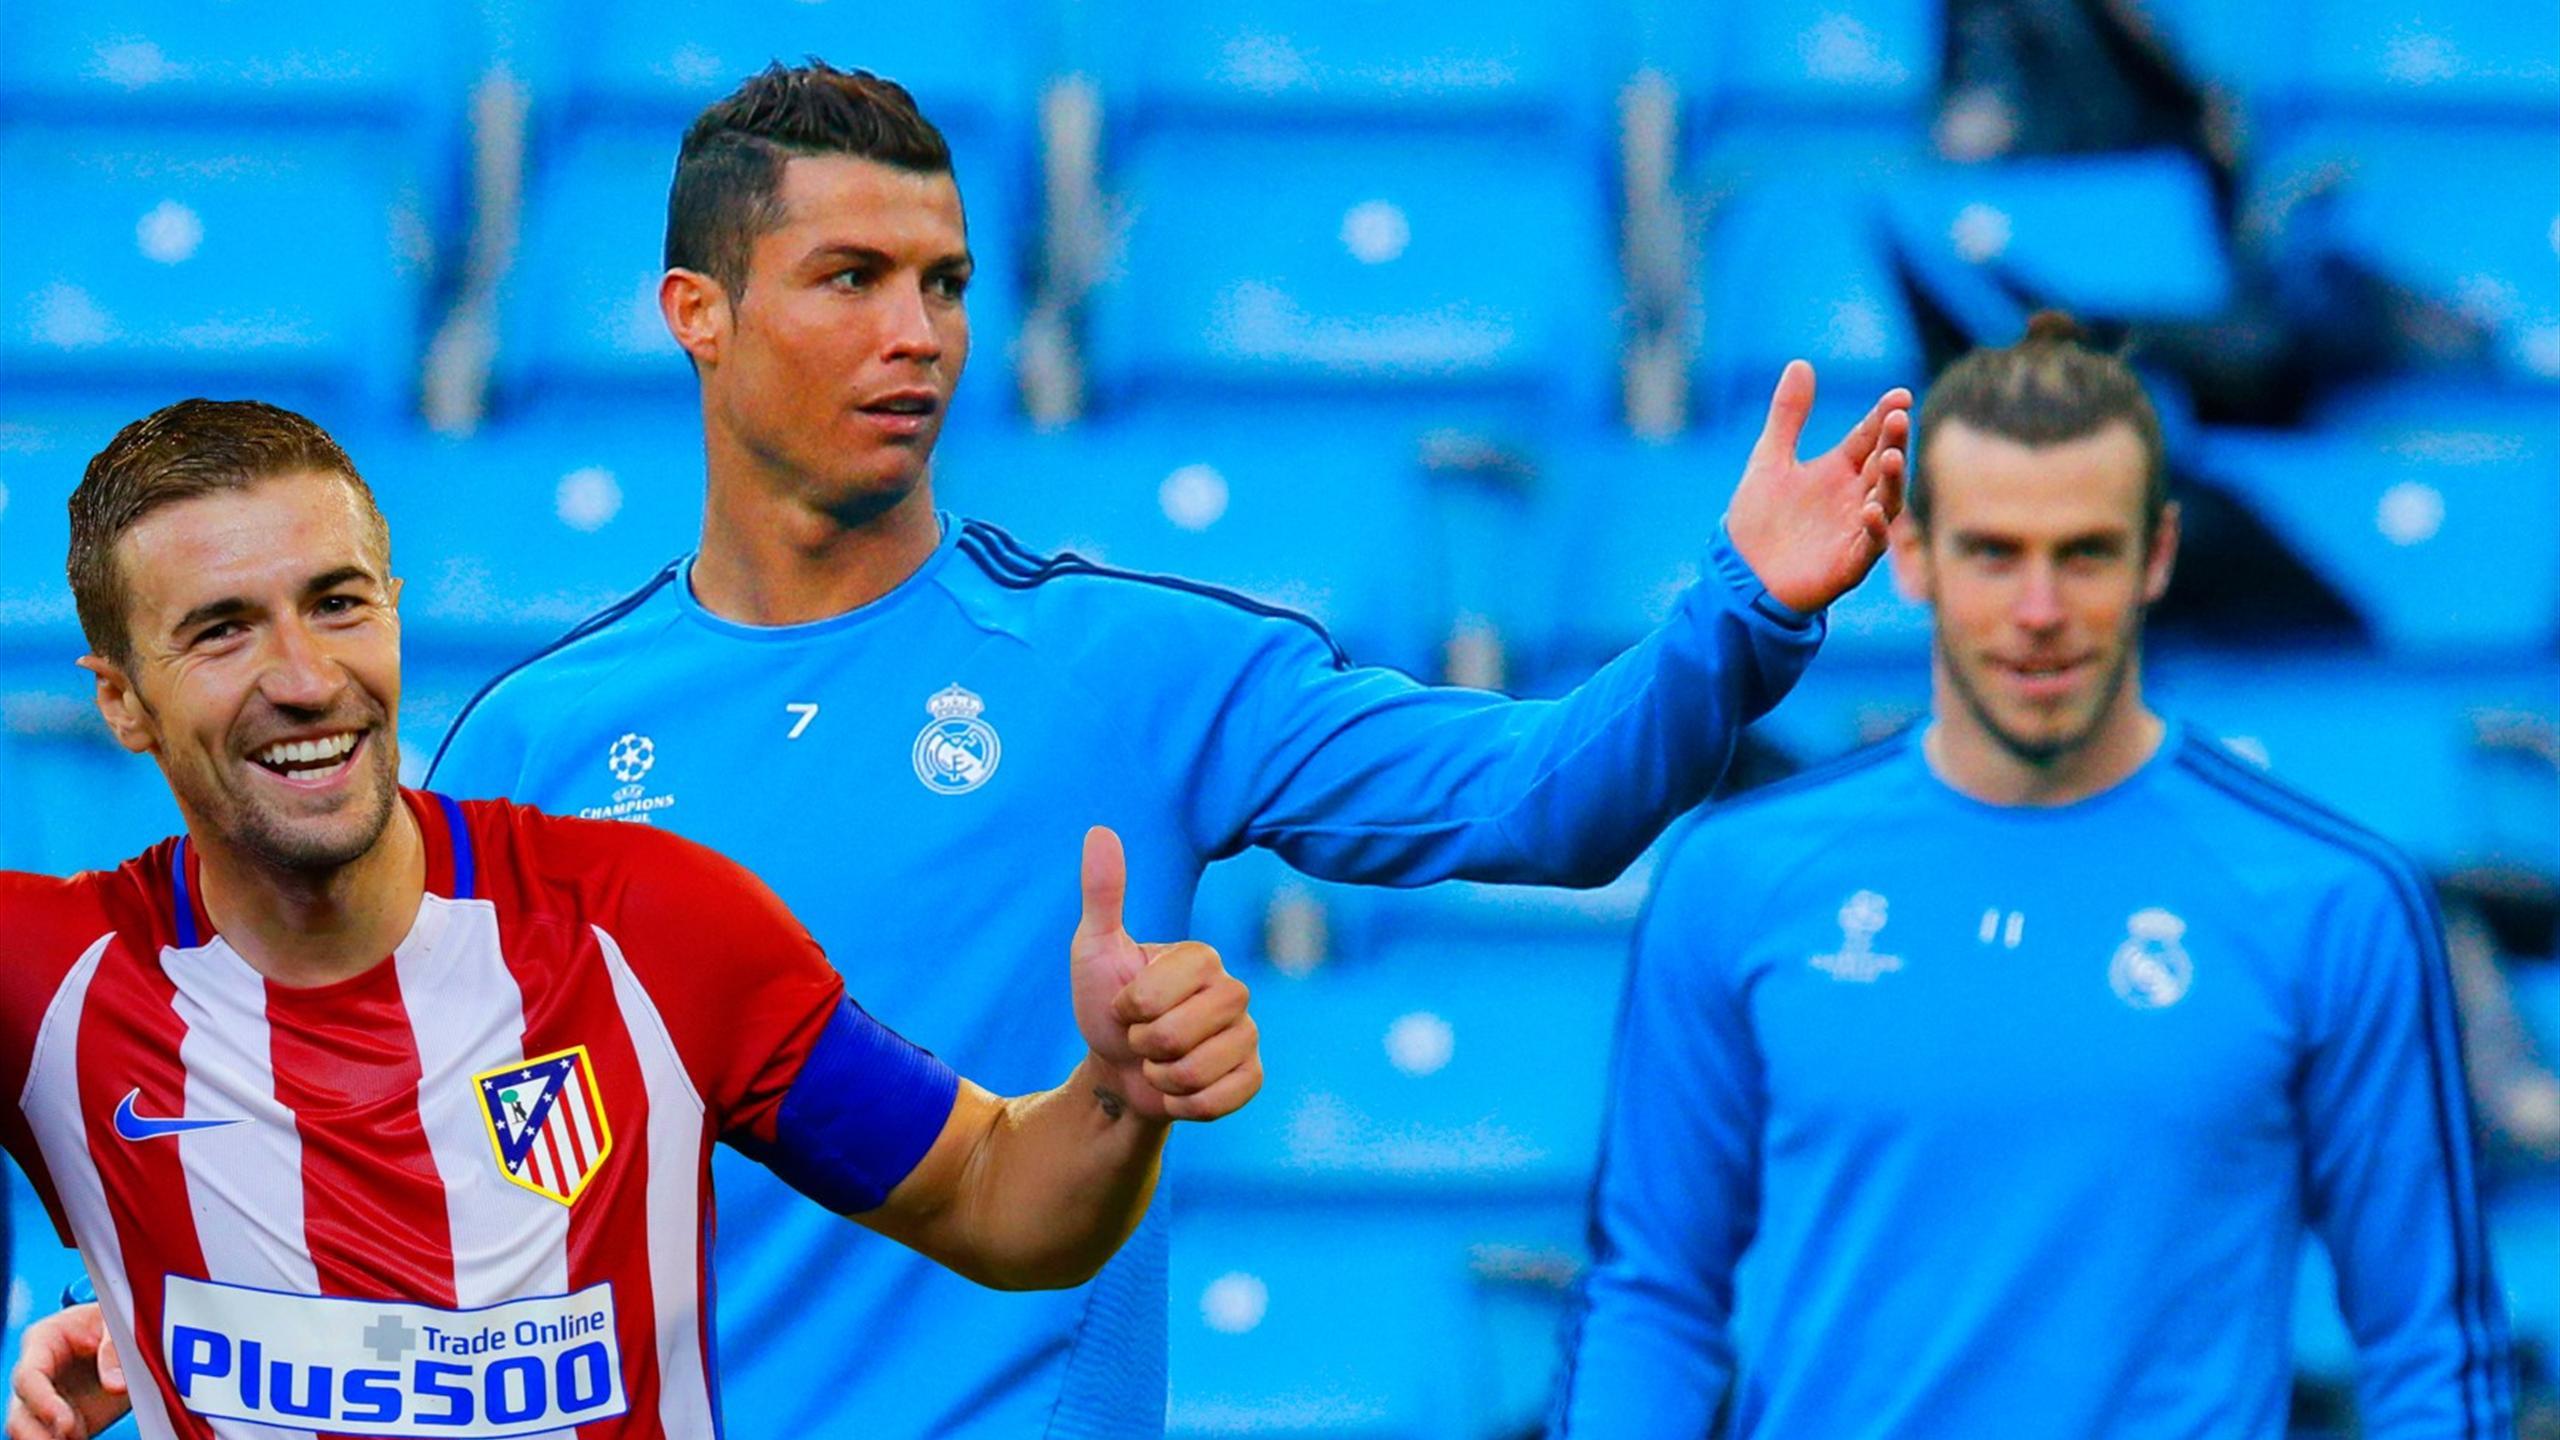 Atletico Madrid's Gabi and Real Madrid's Cristiano Ronaldo and Gareth Bale